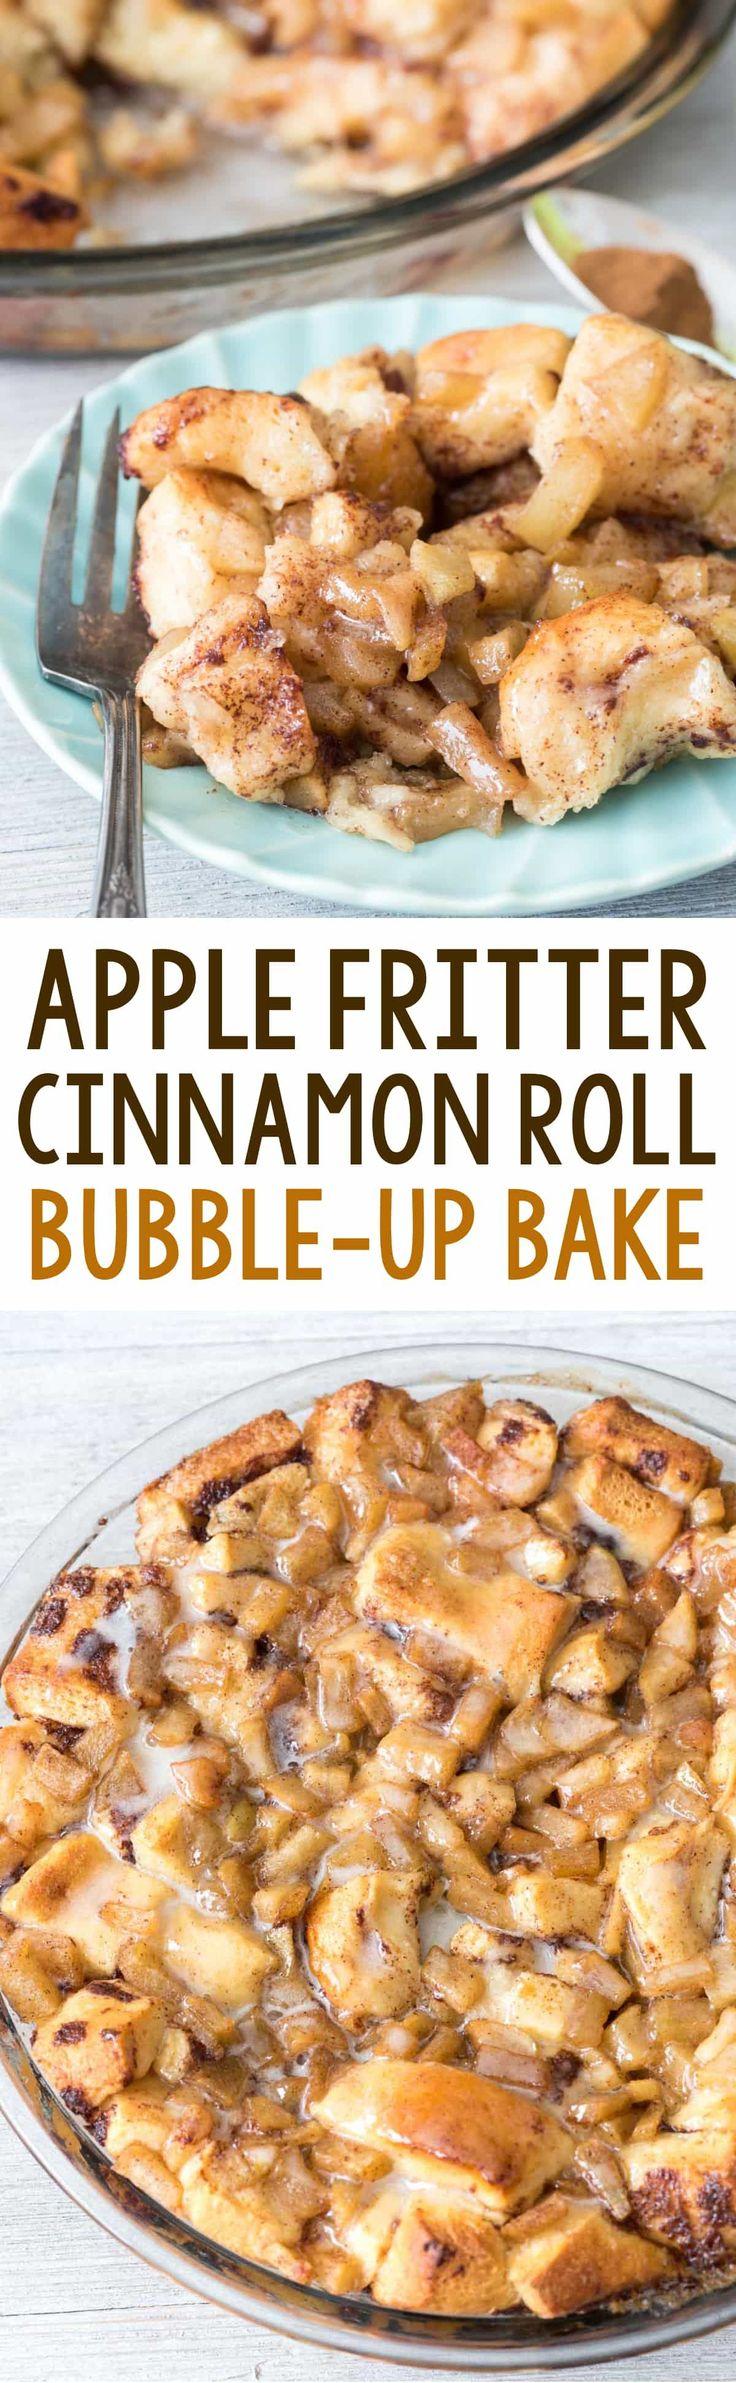 Easy Apple Fritter Cinnamon Roll Bake - canned cinnamon rolls mixed with cinnamon apples baked like monkey bread! It's like an apple fritter cinnamon roll!